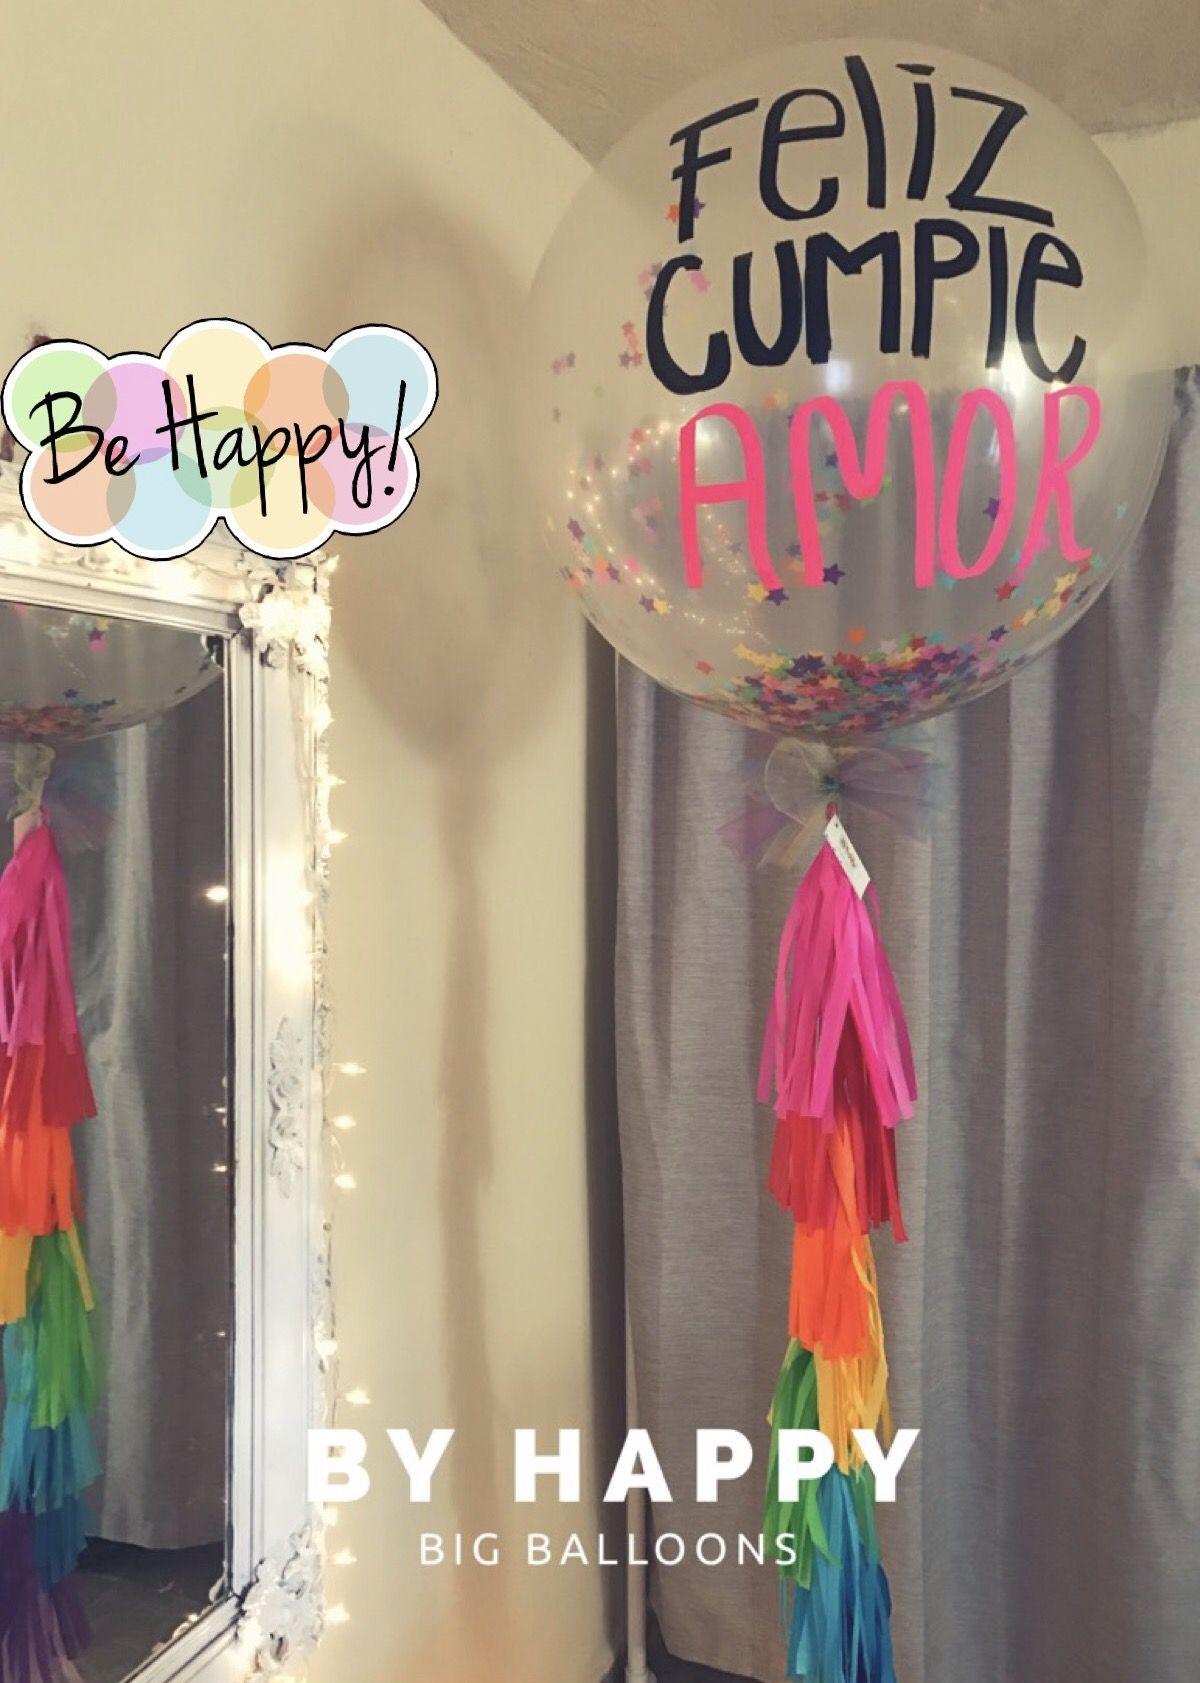 Big balloons Globos gigantes Pinterest Big, Ideas para and Birthdays